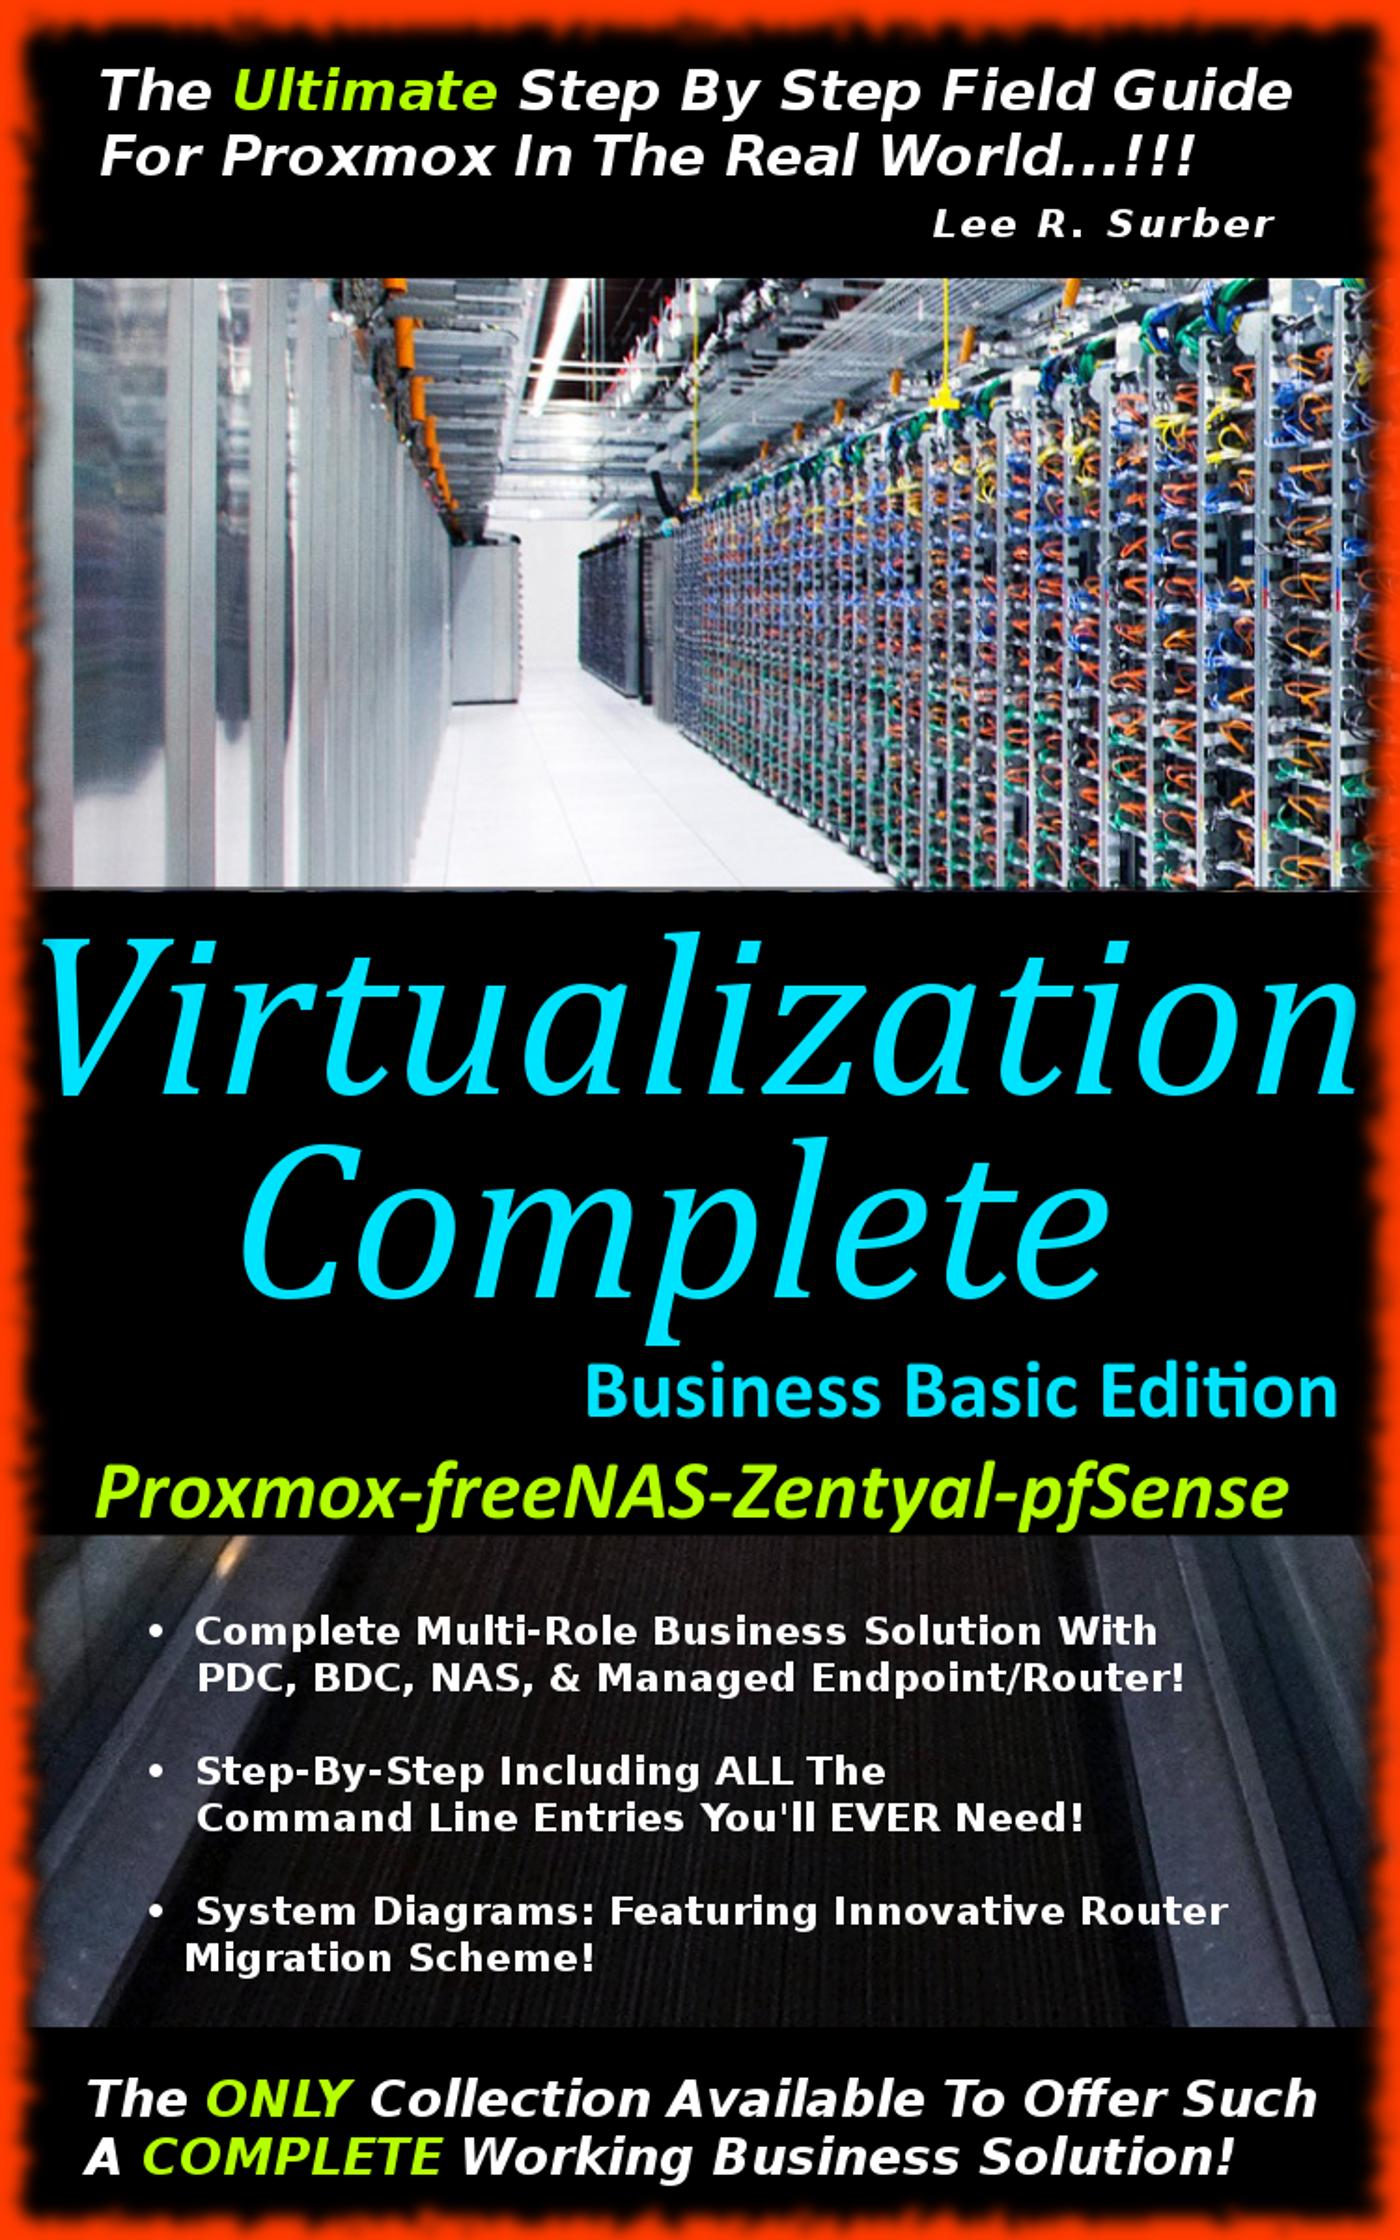 Virtualization Complete: Business Basic Edition  (Proxmox-freeNAS-Zentyal-pfSense), an Ebook by Lee Surber